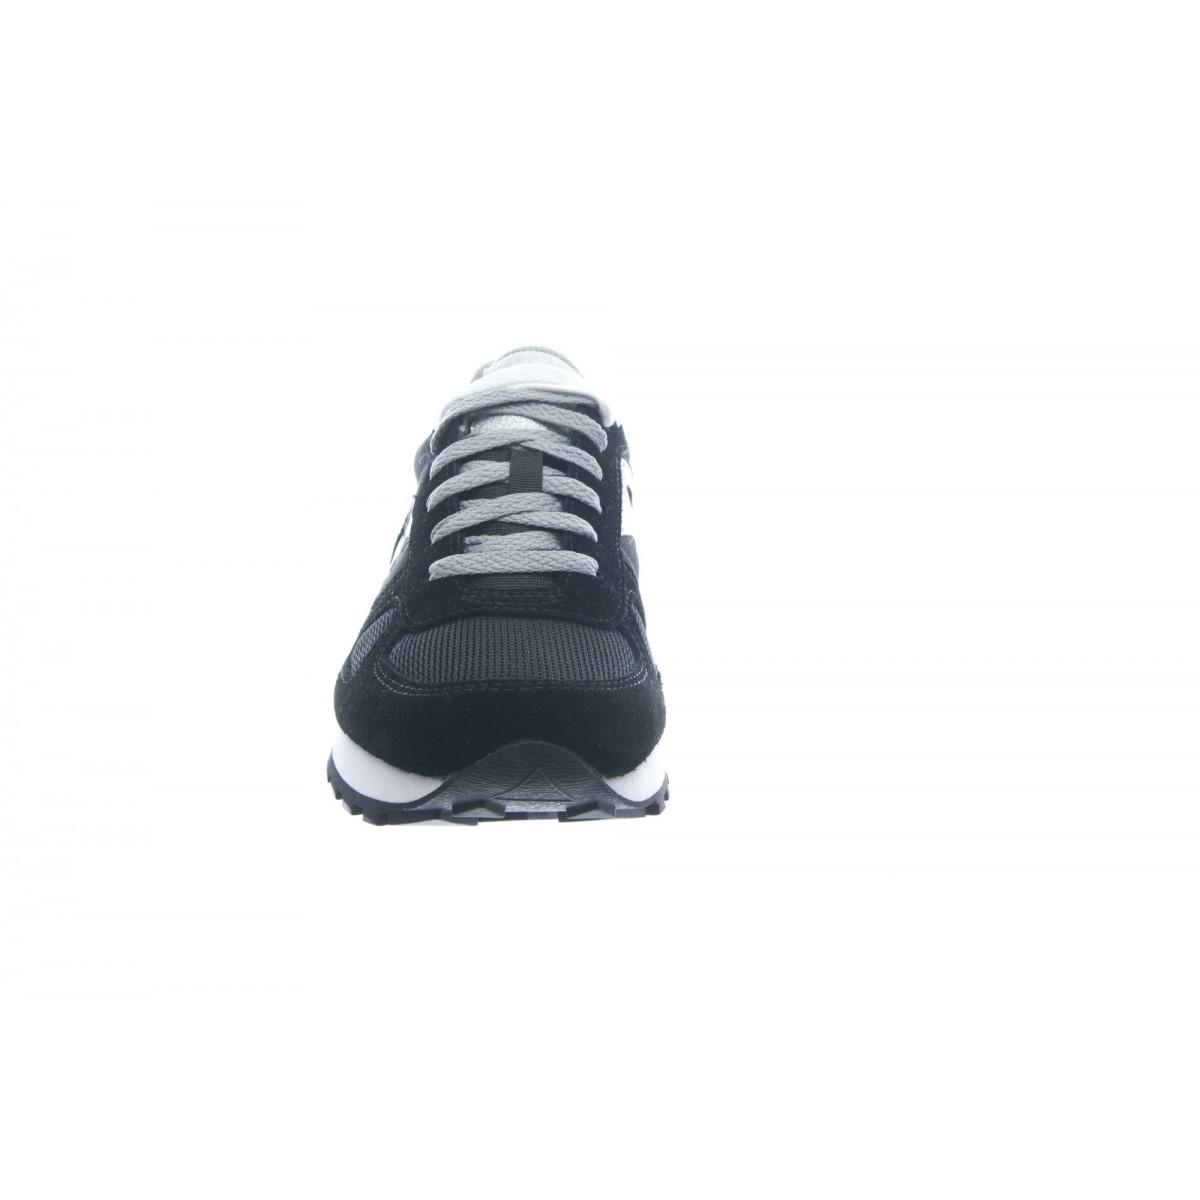 Scarpe - 1108 shadow